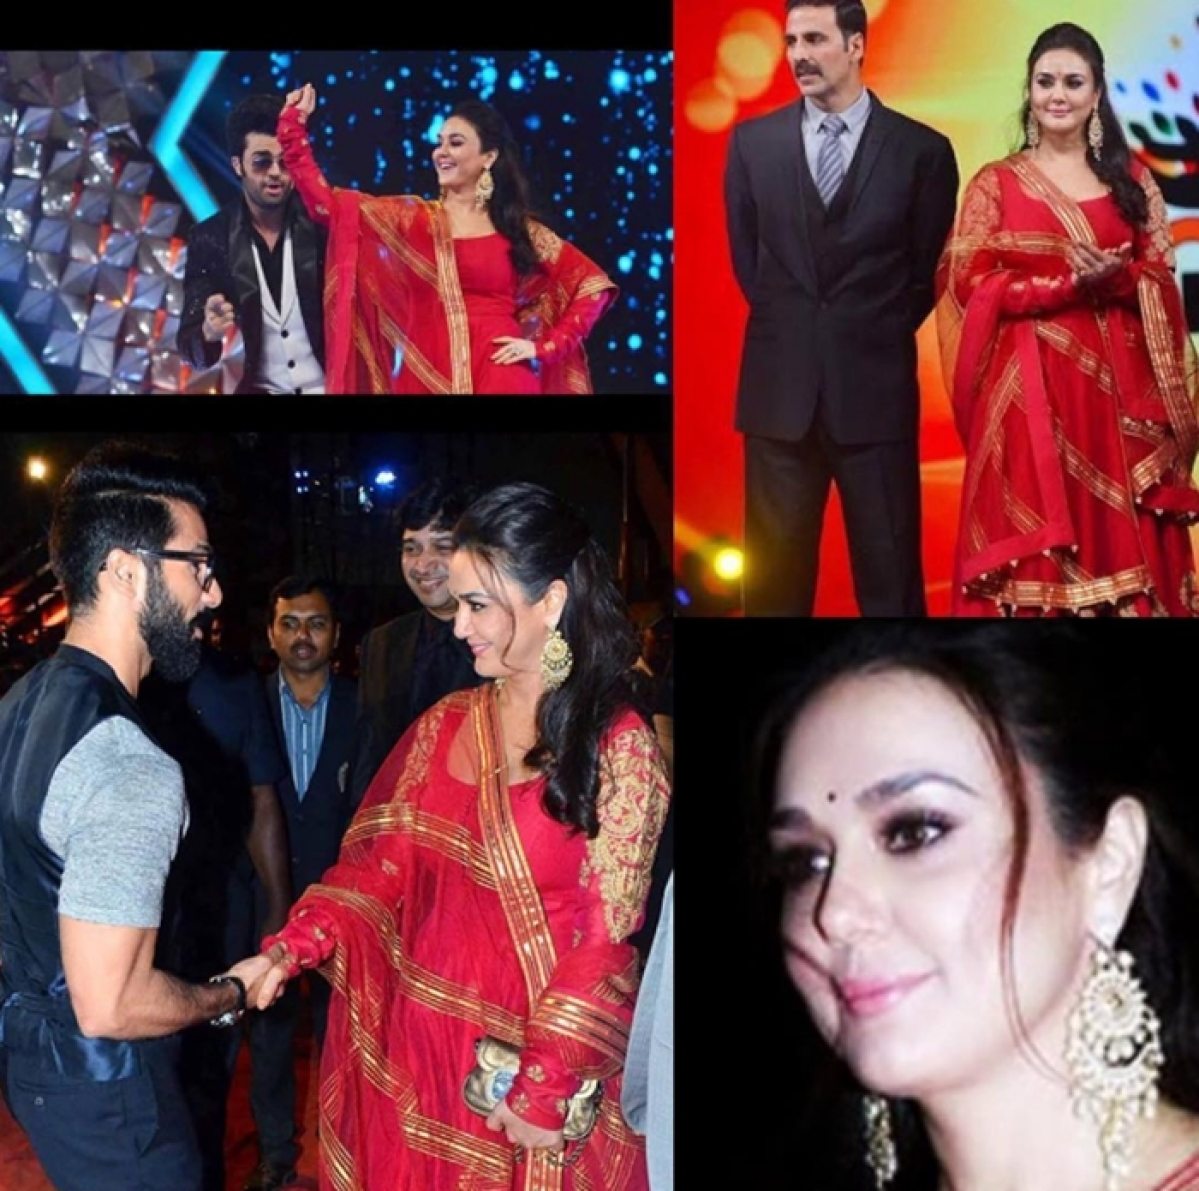 Madhuri, Shilpa, Ranveer, Anushka celebrates Umang 2017 in Mumbai